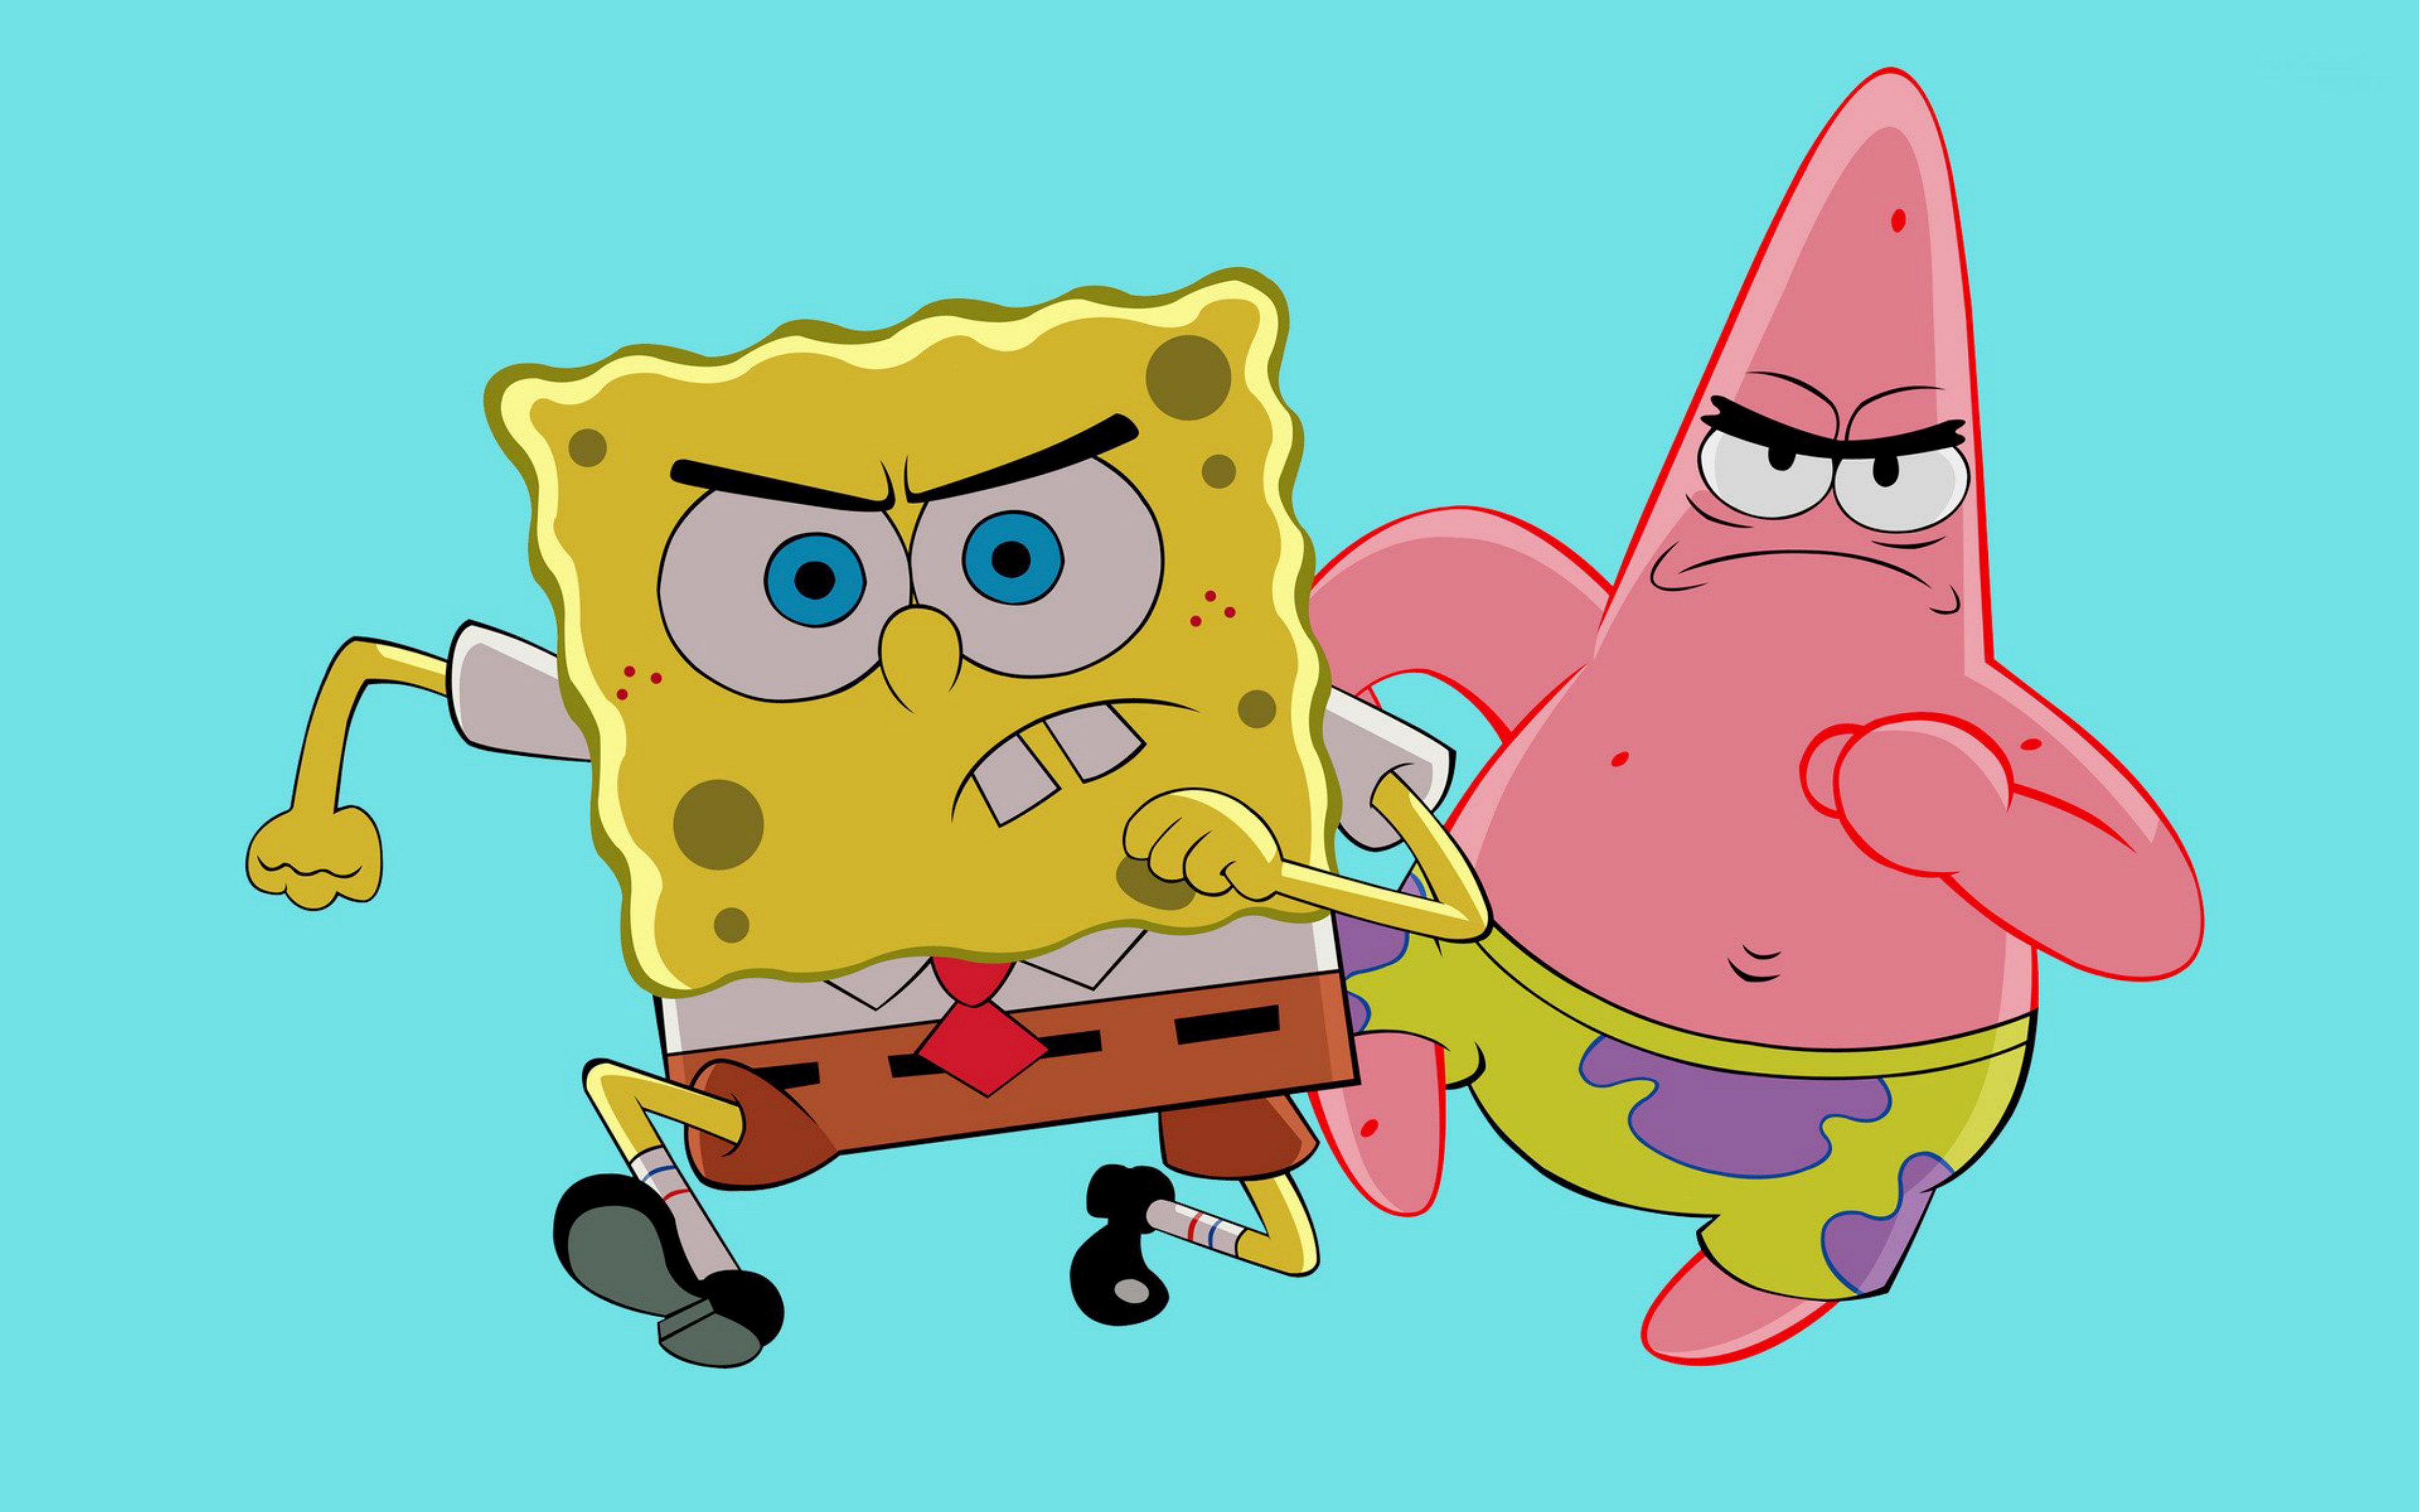 Alpha coders wallpaper abyss tv show spongebob squarepants 233957